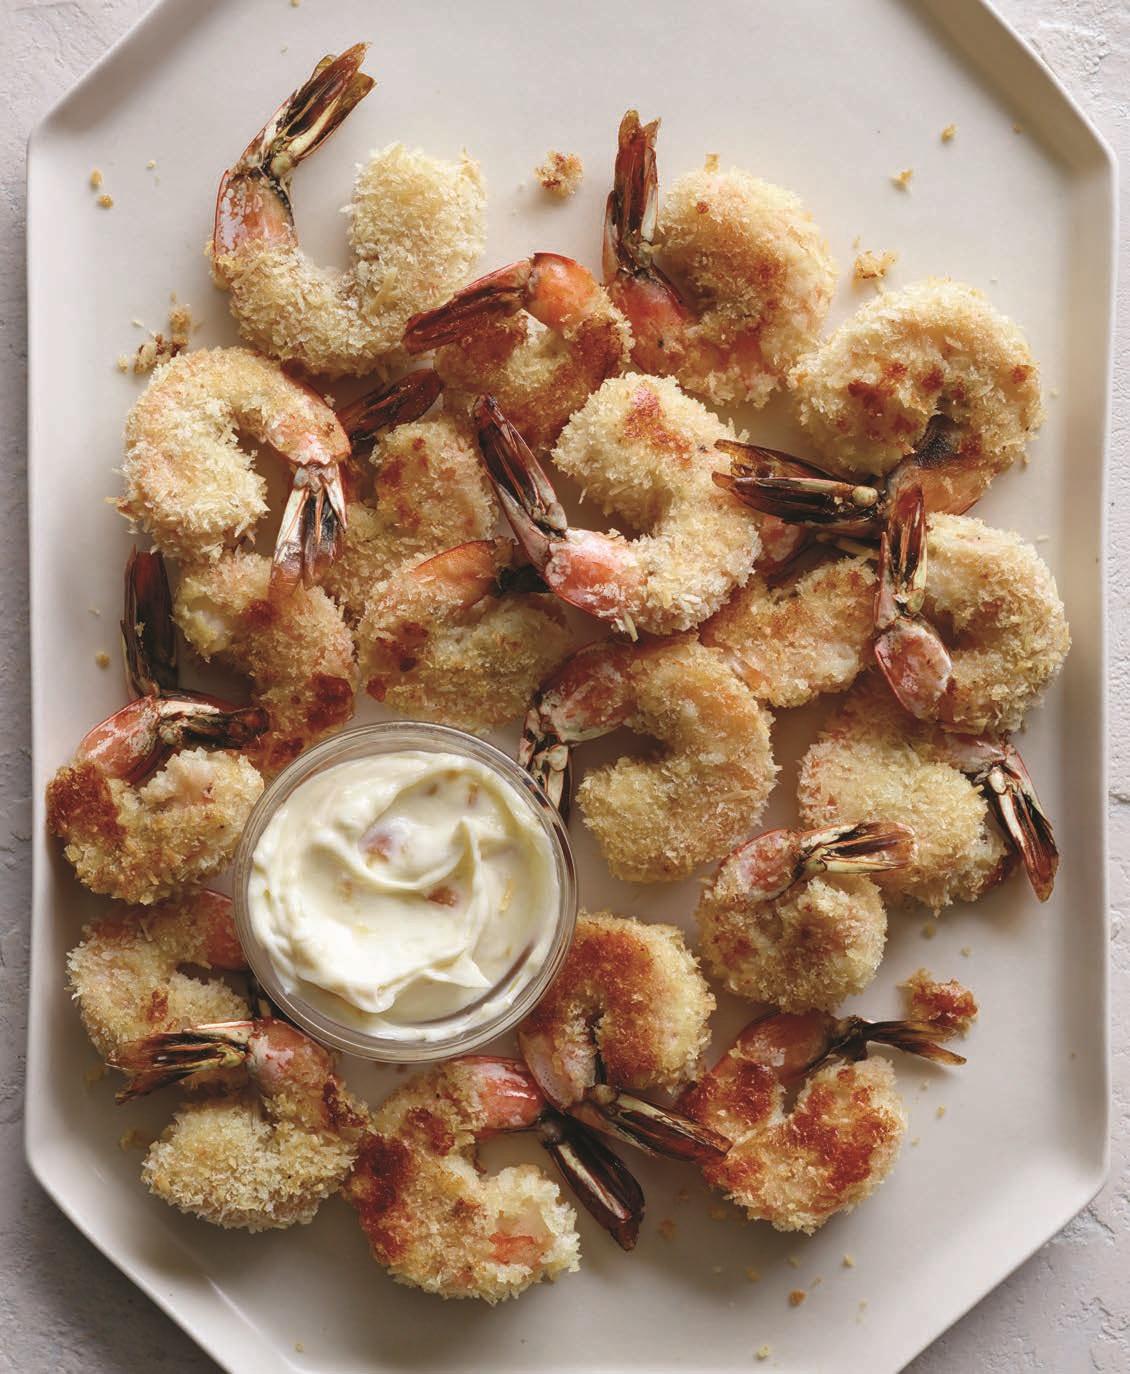 Laila Ali Quinoa and parmesan shrimp_Food for Life.jpg